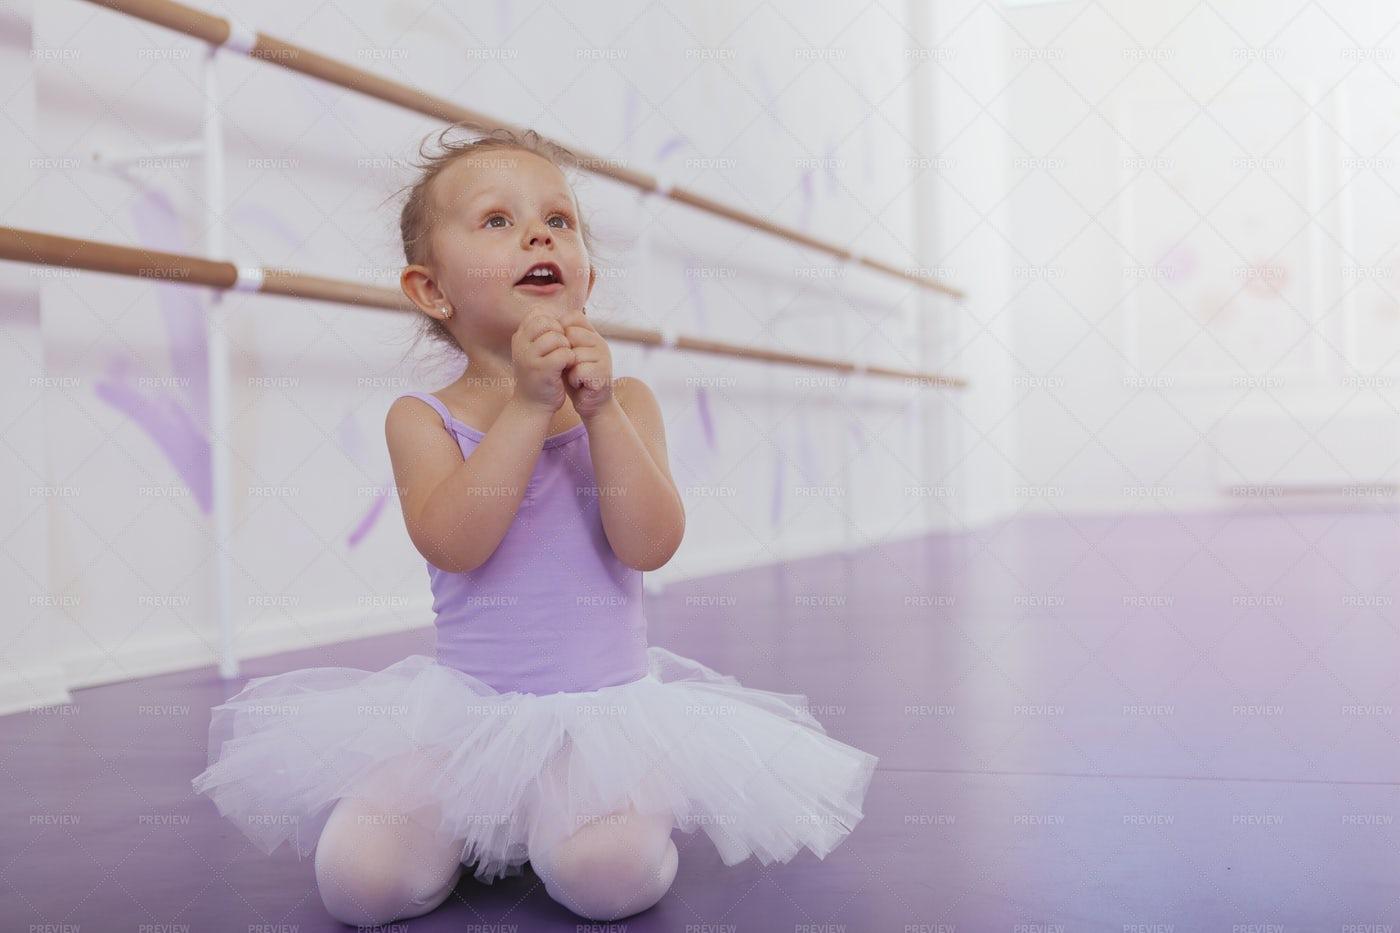 Excited Ballerina: Stock Photos